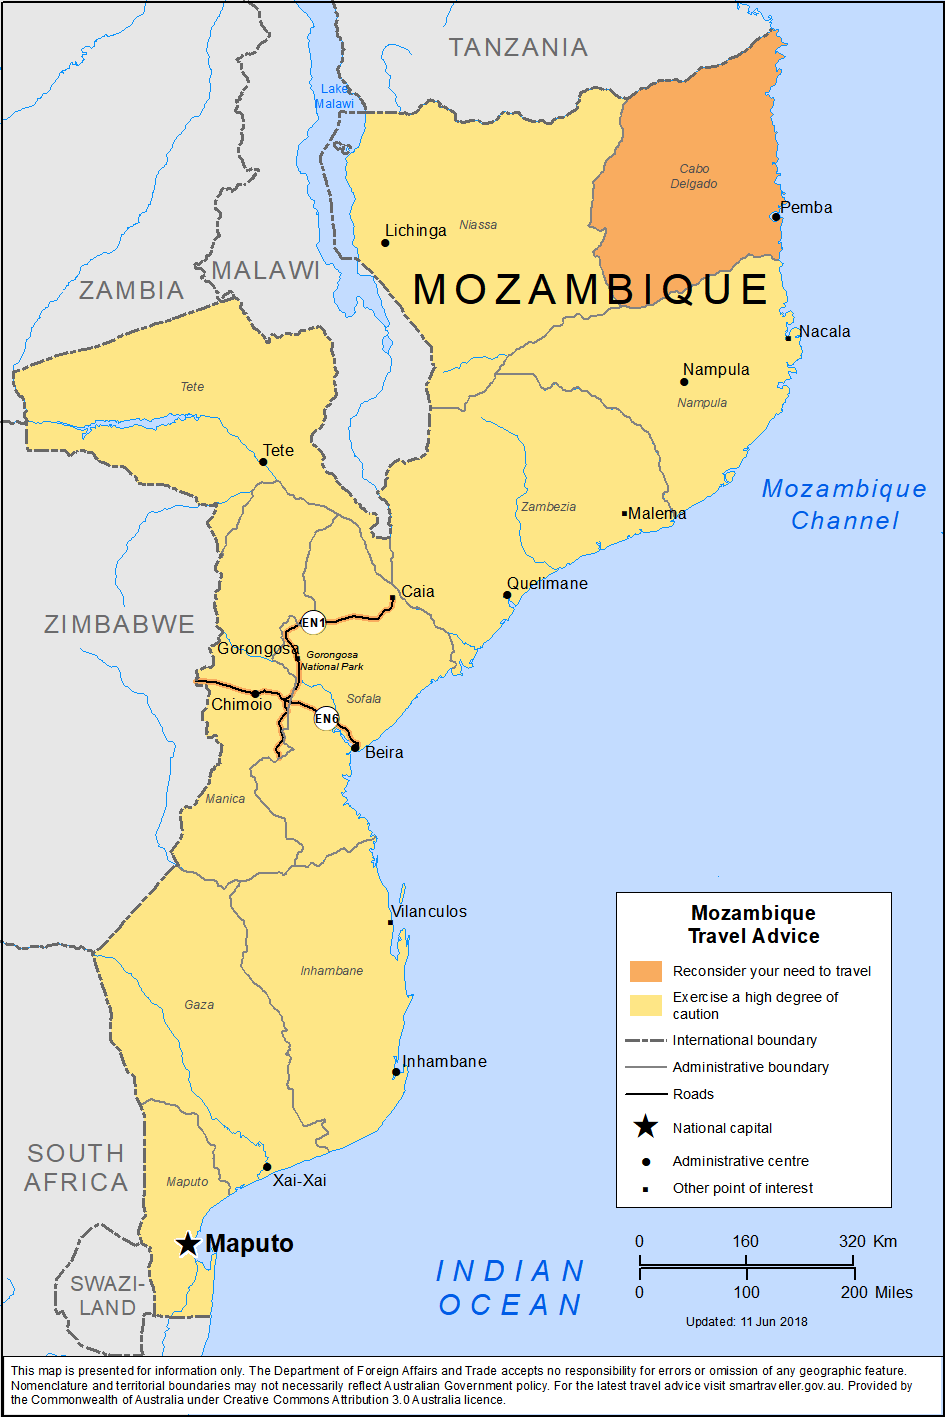 Mozambique-Travel-Insurance | AardvarkCompare.com